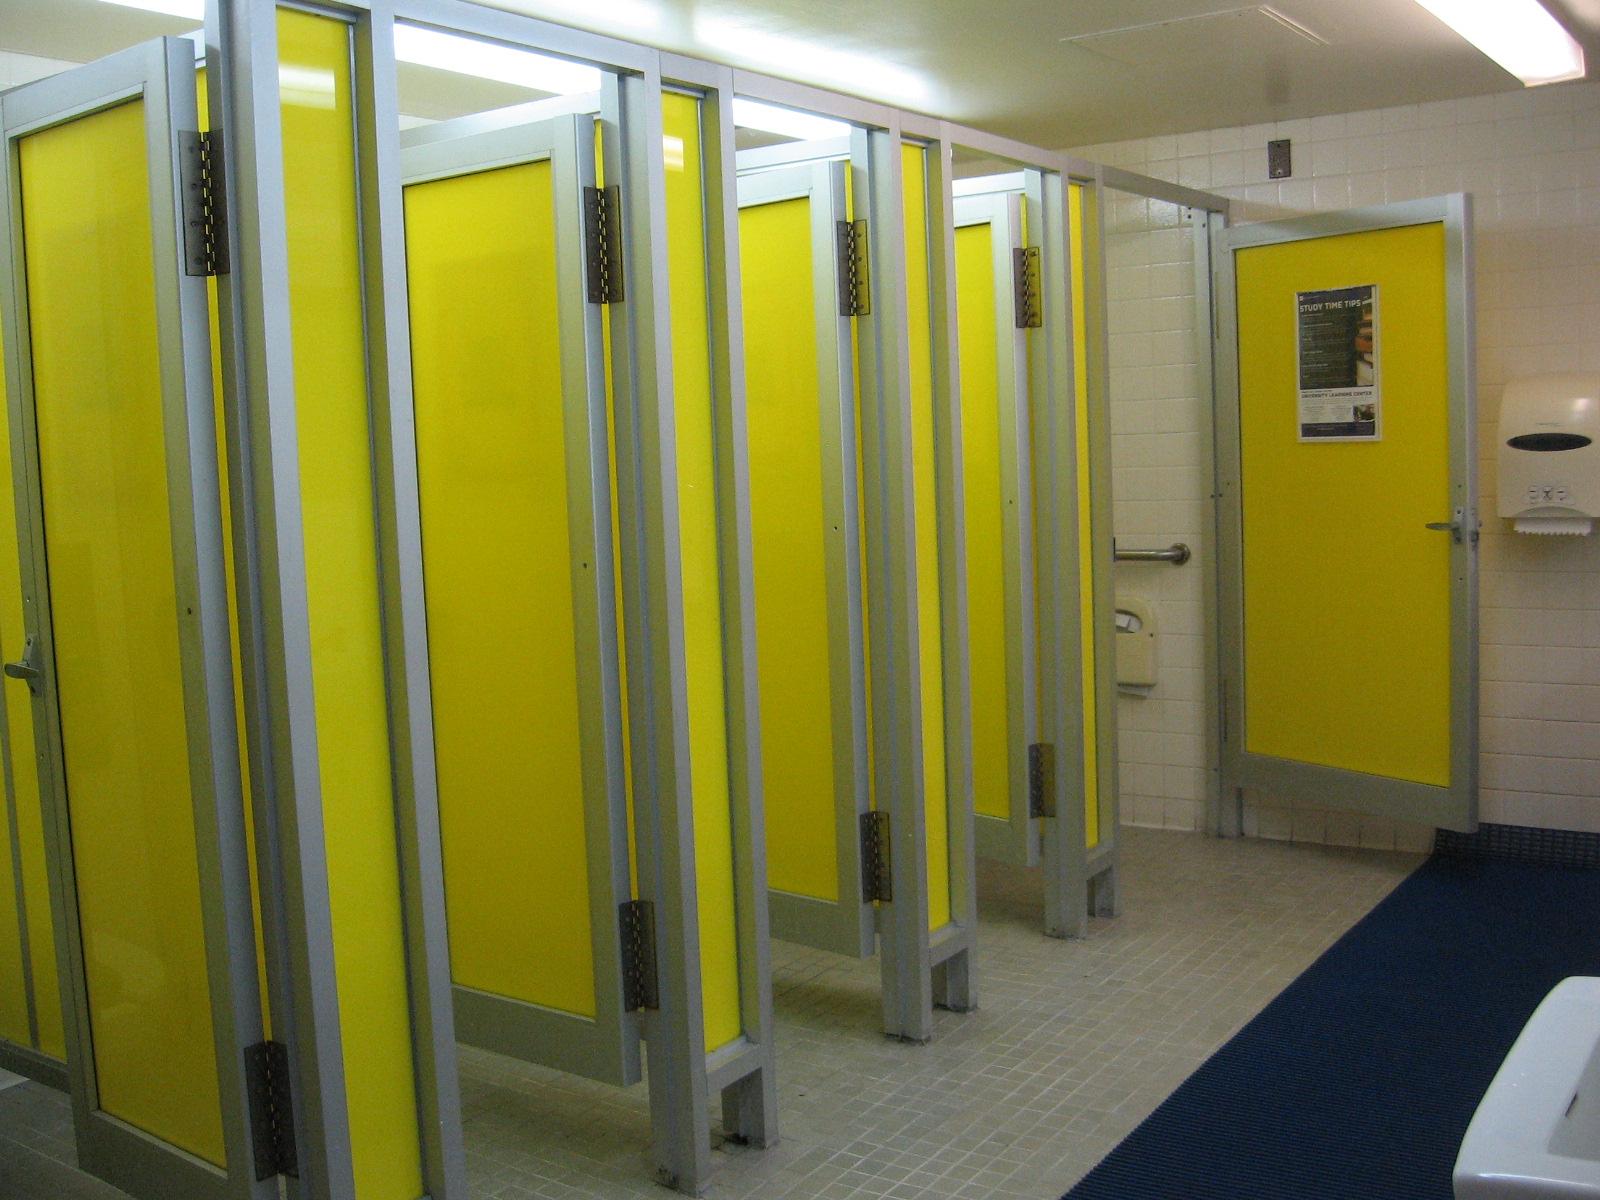 School Restroom Stalls Bright Yellow Bathroom Stalls. Restroom Stall Clipart   Clipart Kid